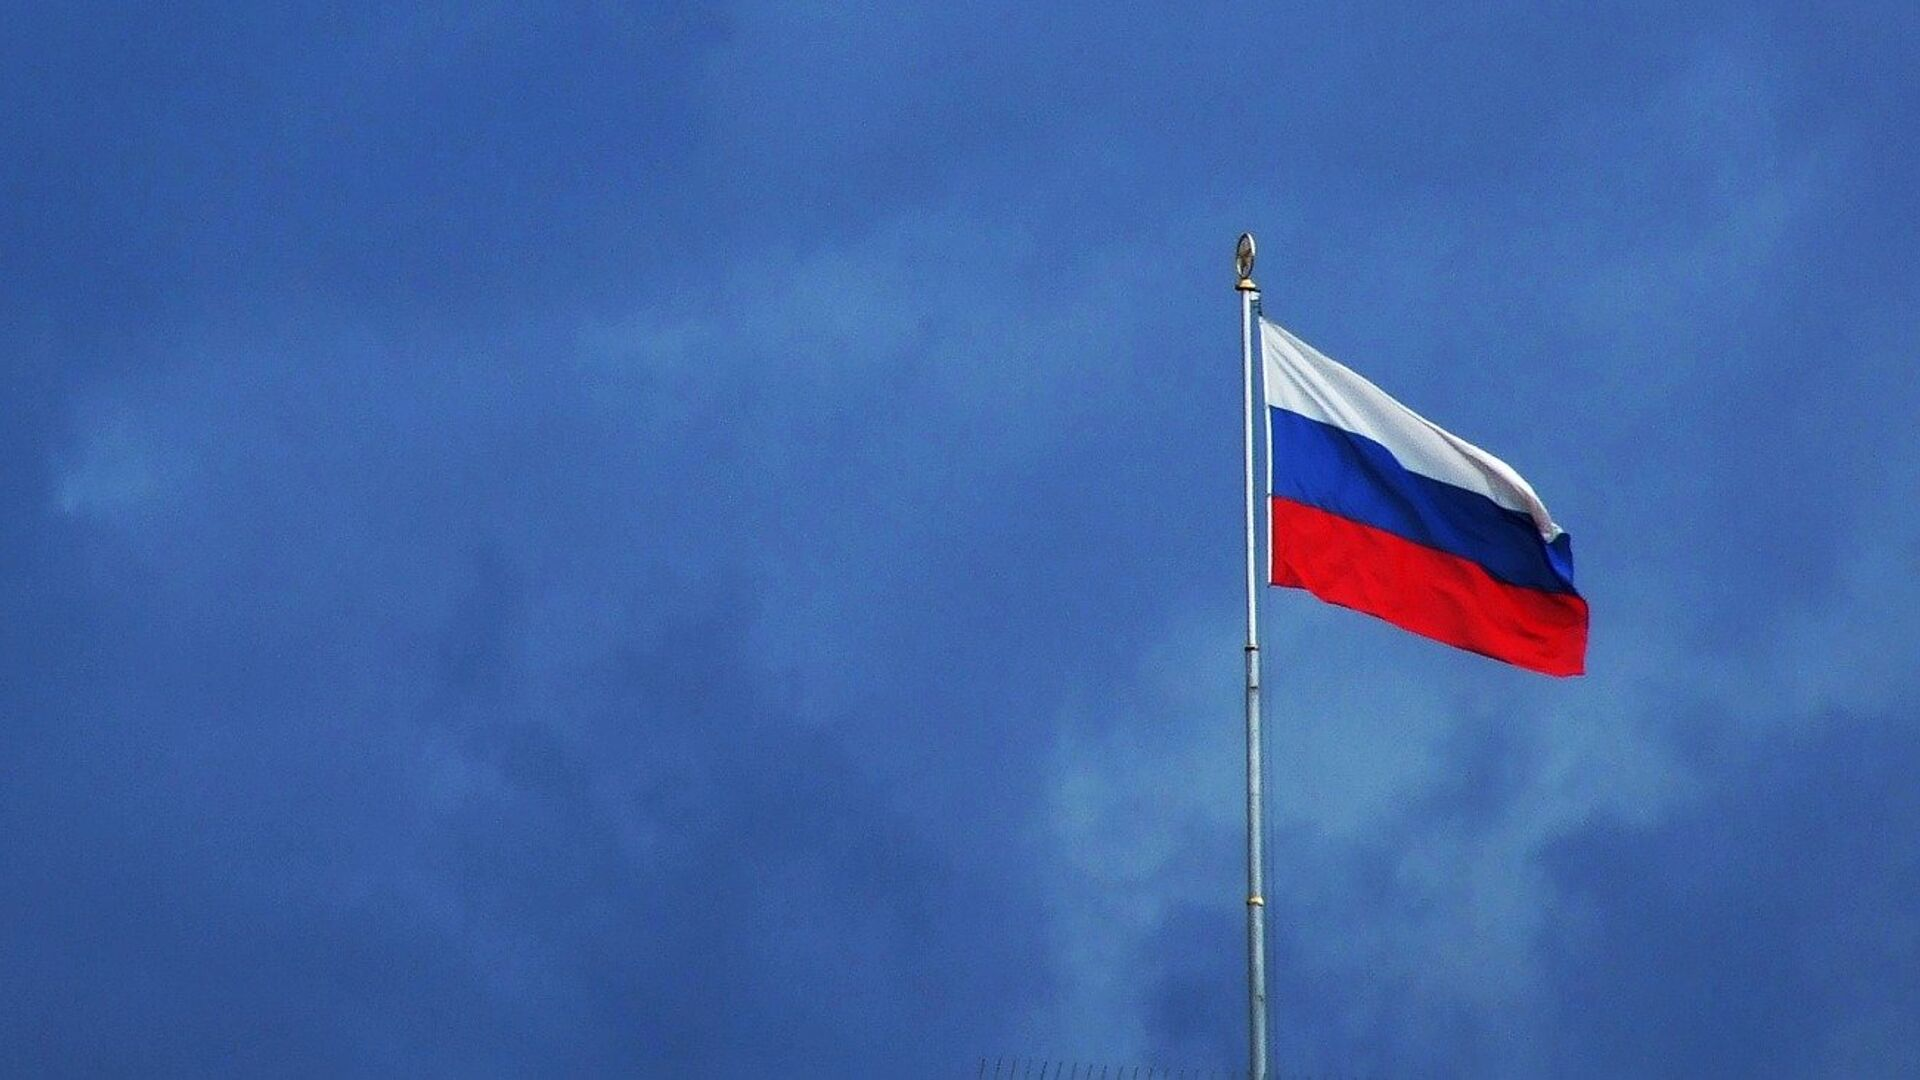 Bandera de Rusia - Sputnik Mundo, 1920, 20.04.2021